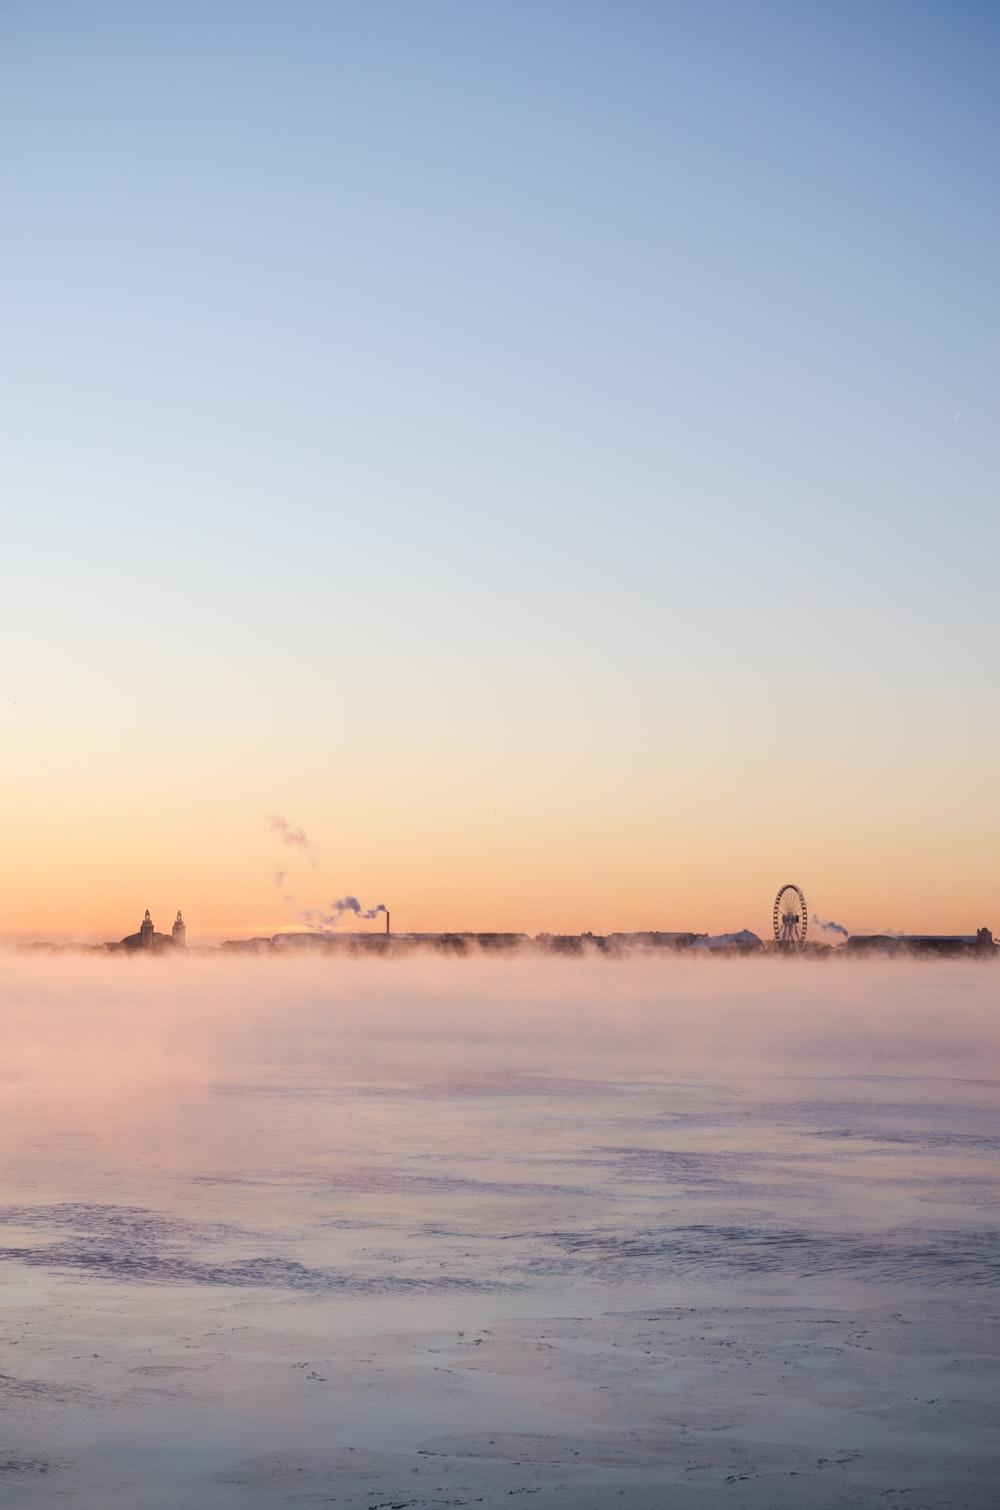 ferris wheel standing over the horizon during daytime